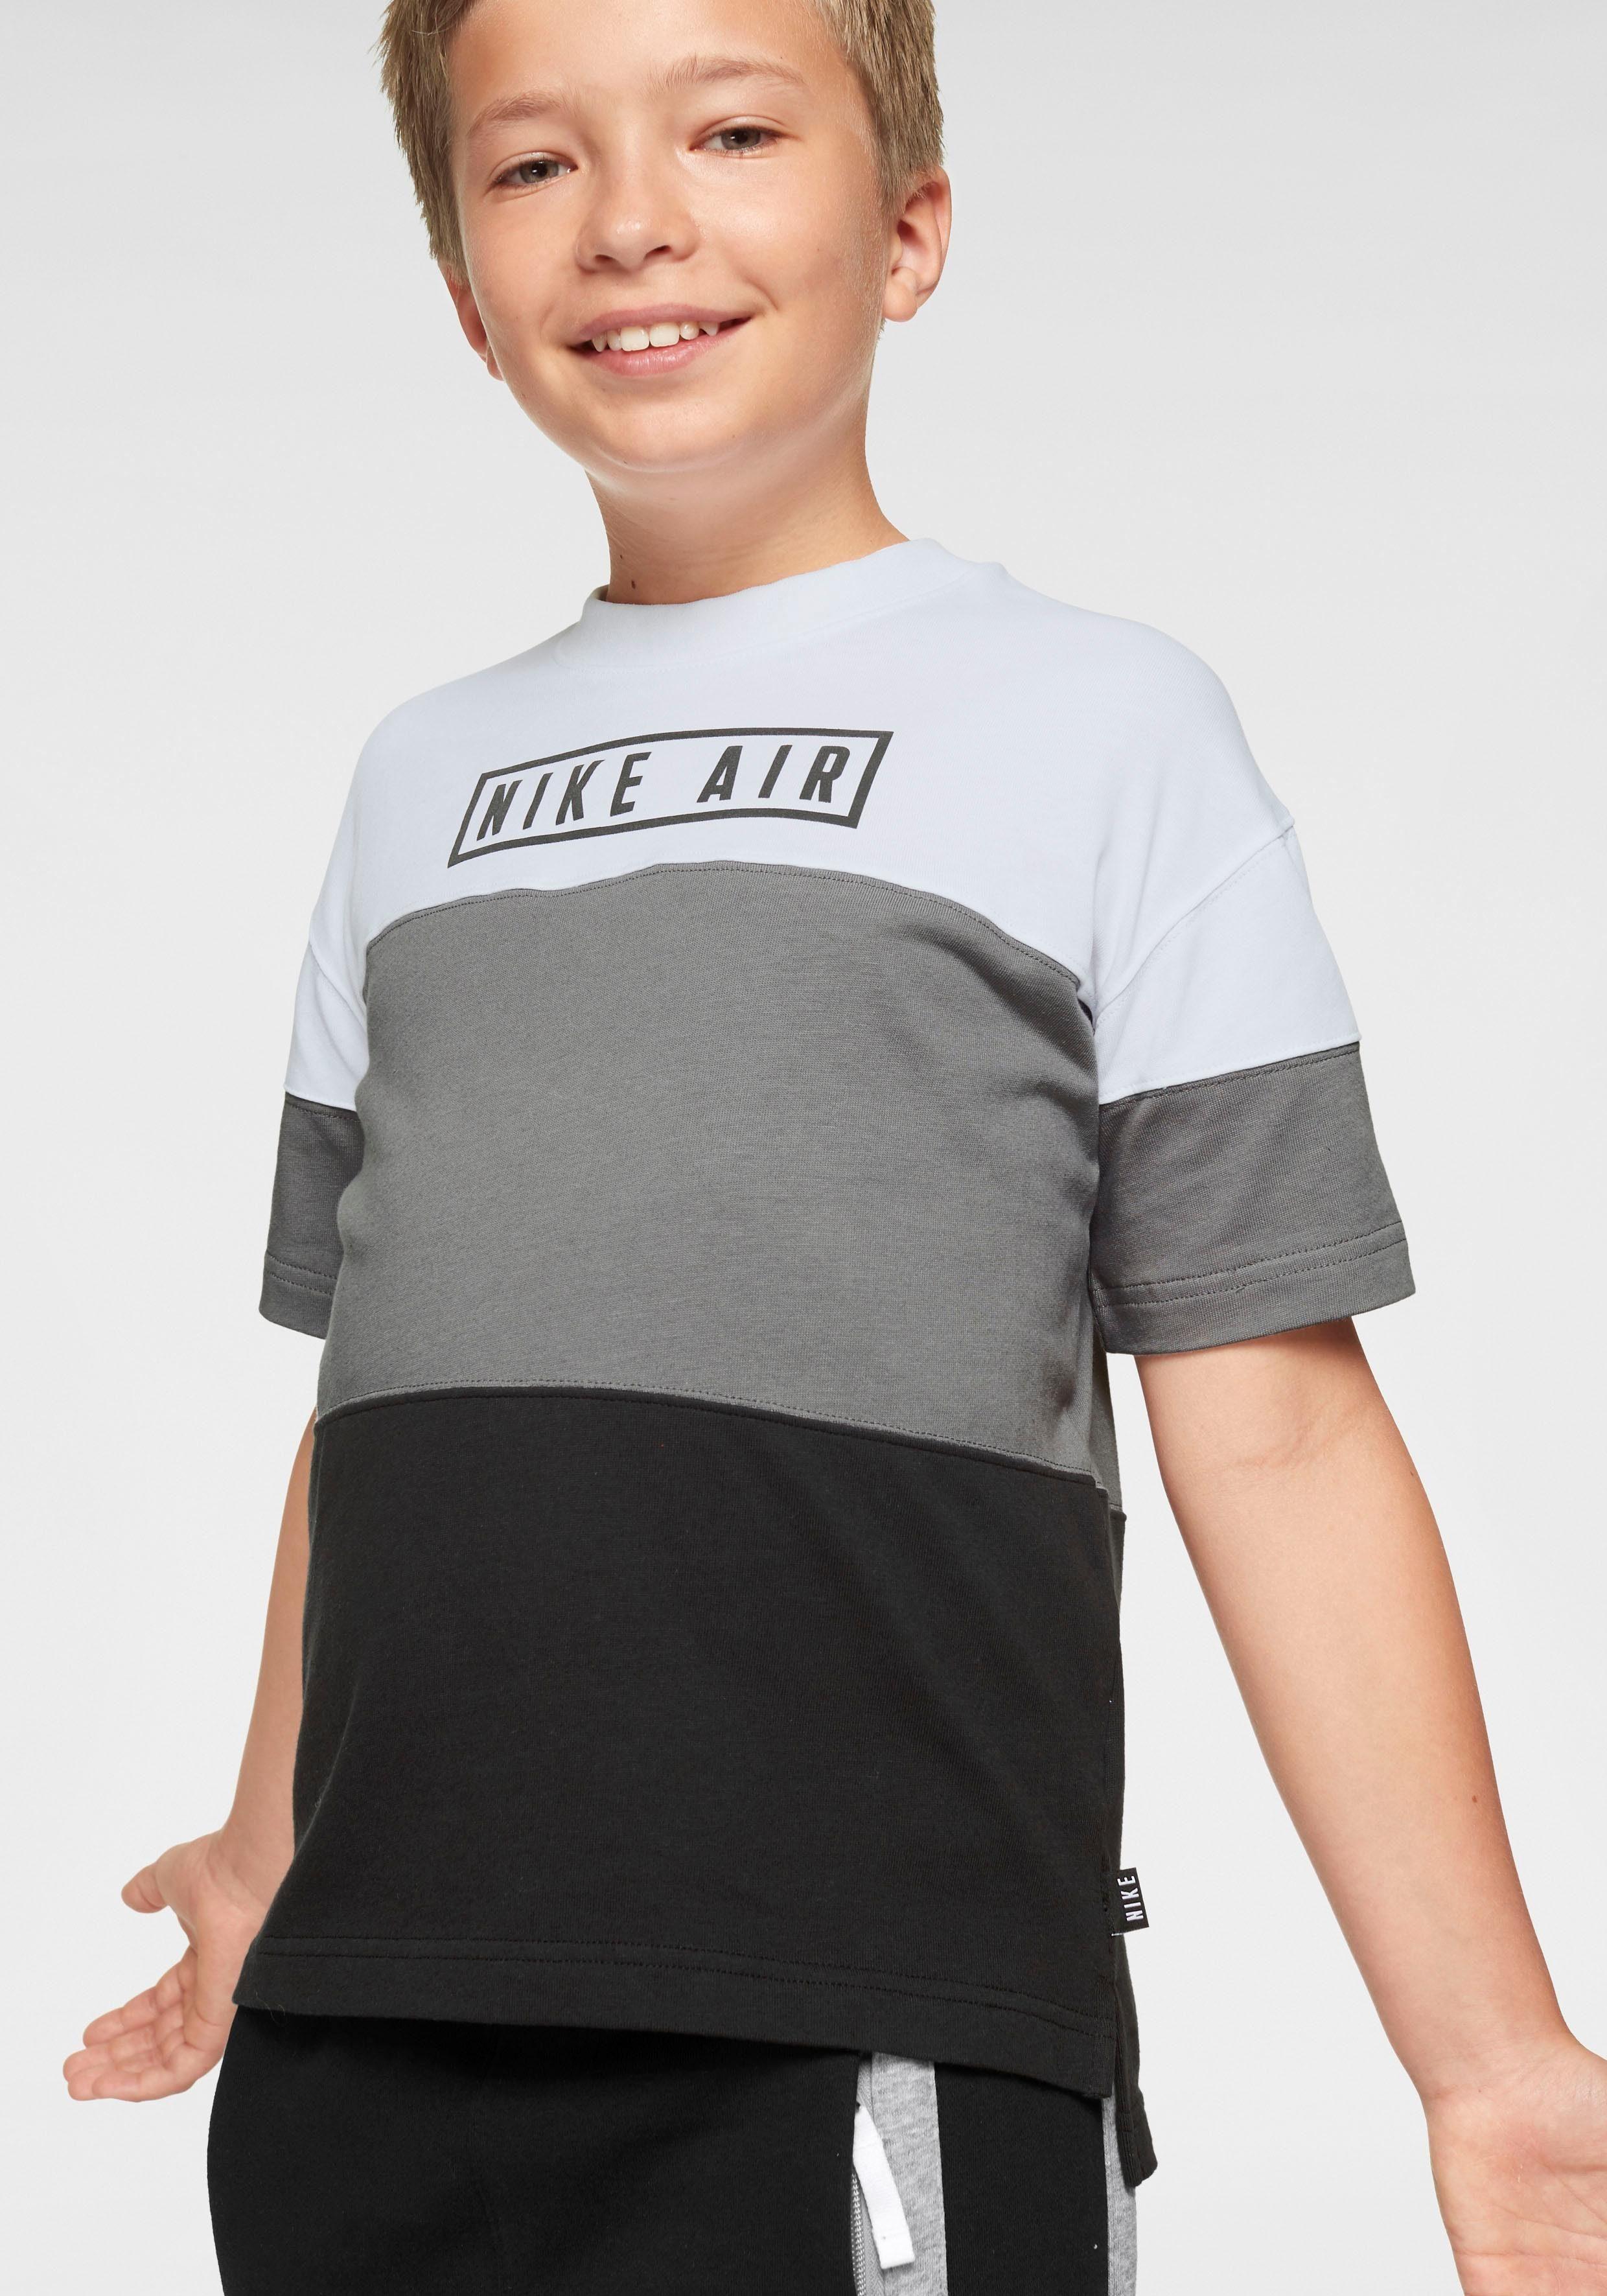 Nike Sportswear T Shirt »BOYS NIKE AIR TOP SHORTSLEEVE« online kaufen | OTTO